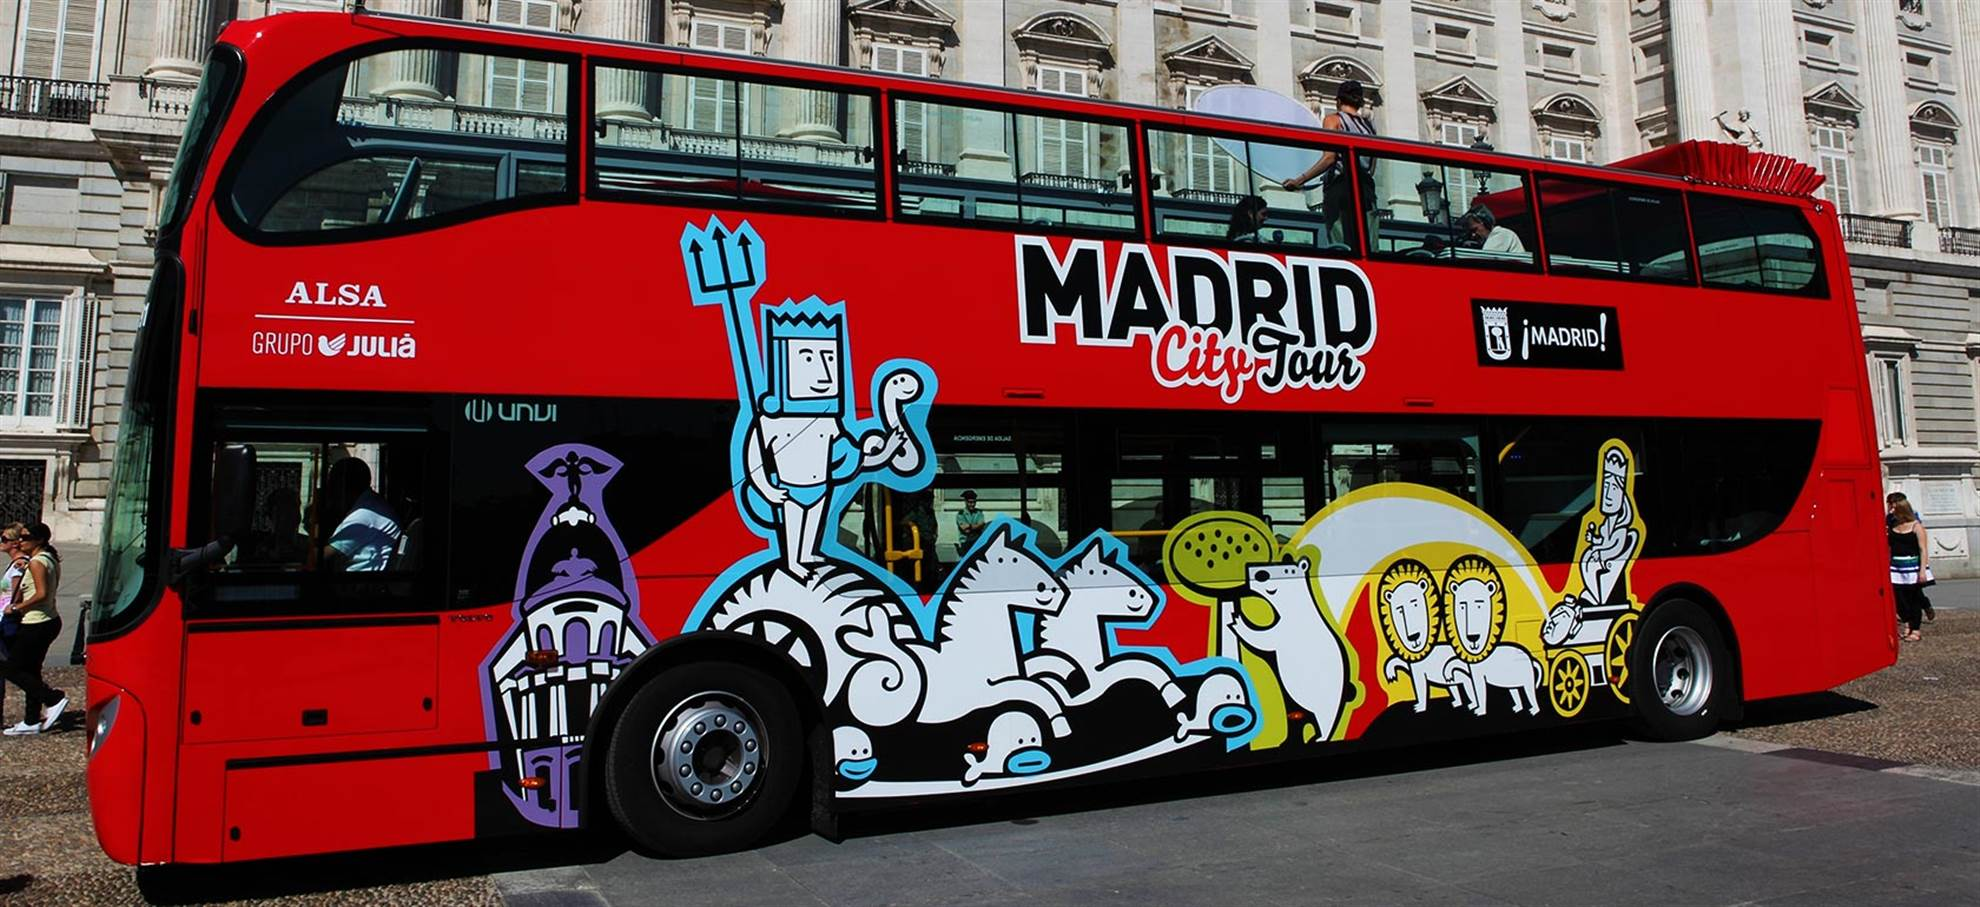 Madridin kiertoajelu